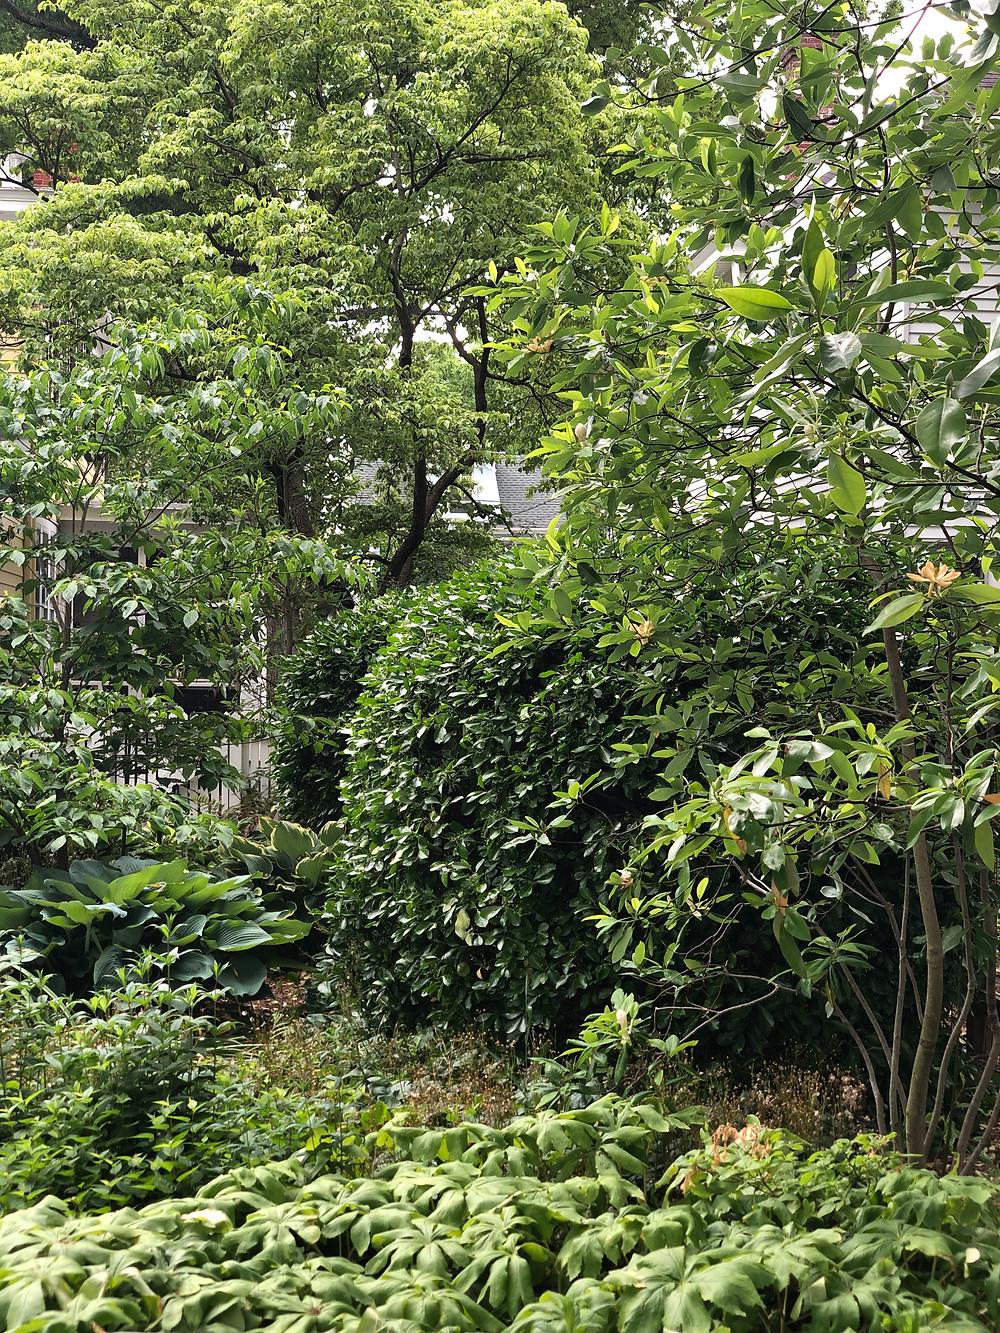 dogwood, sweetbay magnolia, mayapple